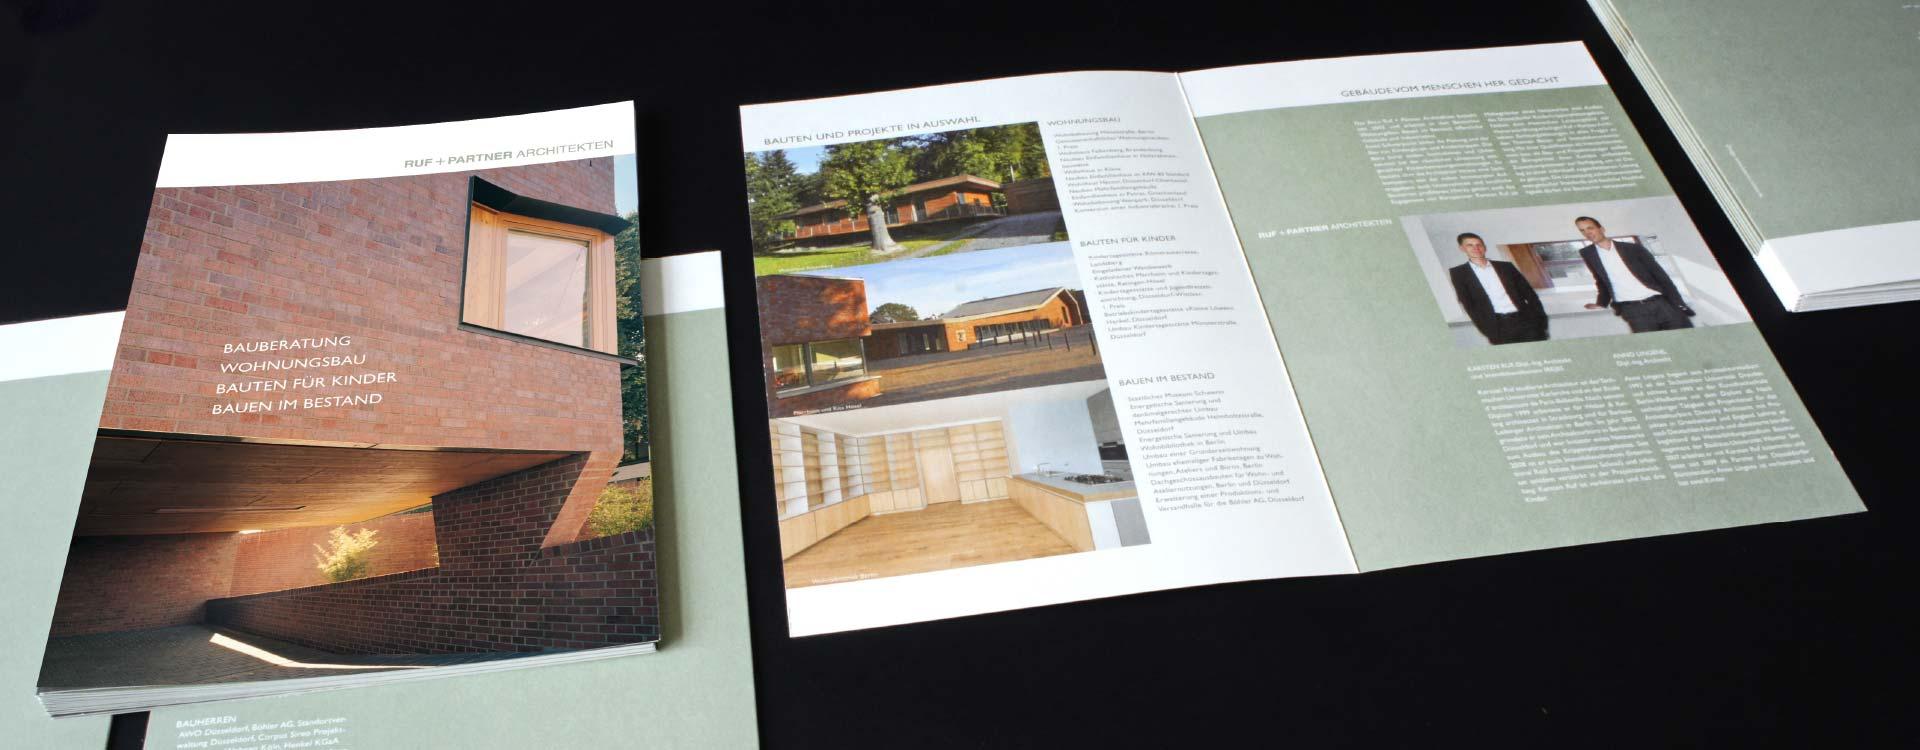 Leaflets for Ruf + Partner architects office; Design: Kattrin Richter | Graphic Design Studio